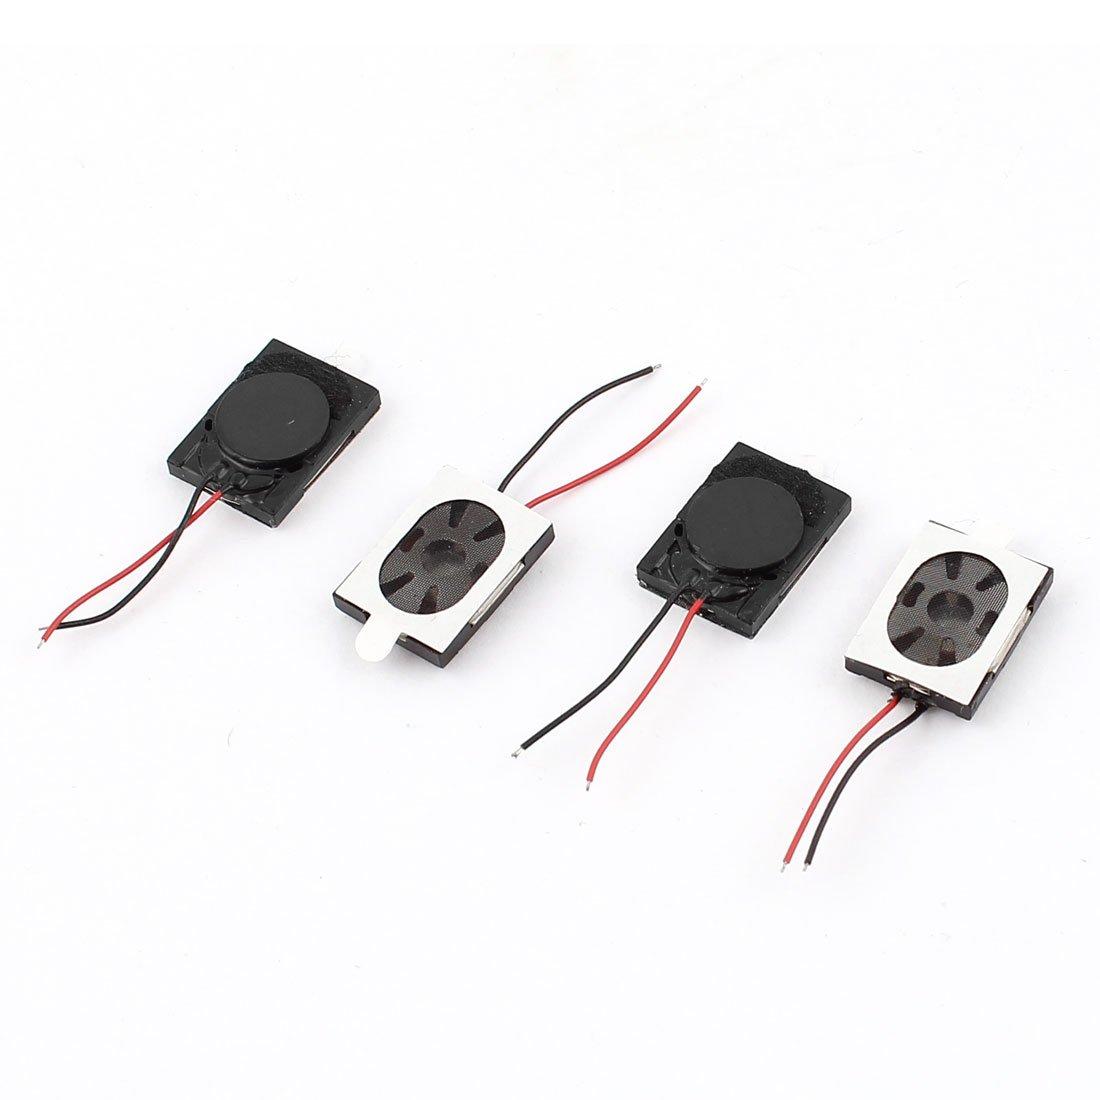 Aexit 4 Pcs 1W 8 Ohm 15x11x3.7mm Magnet Phone Computer Speaker Loudspeaker